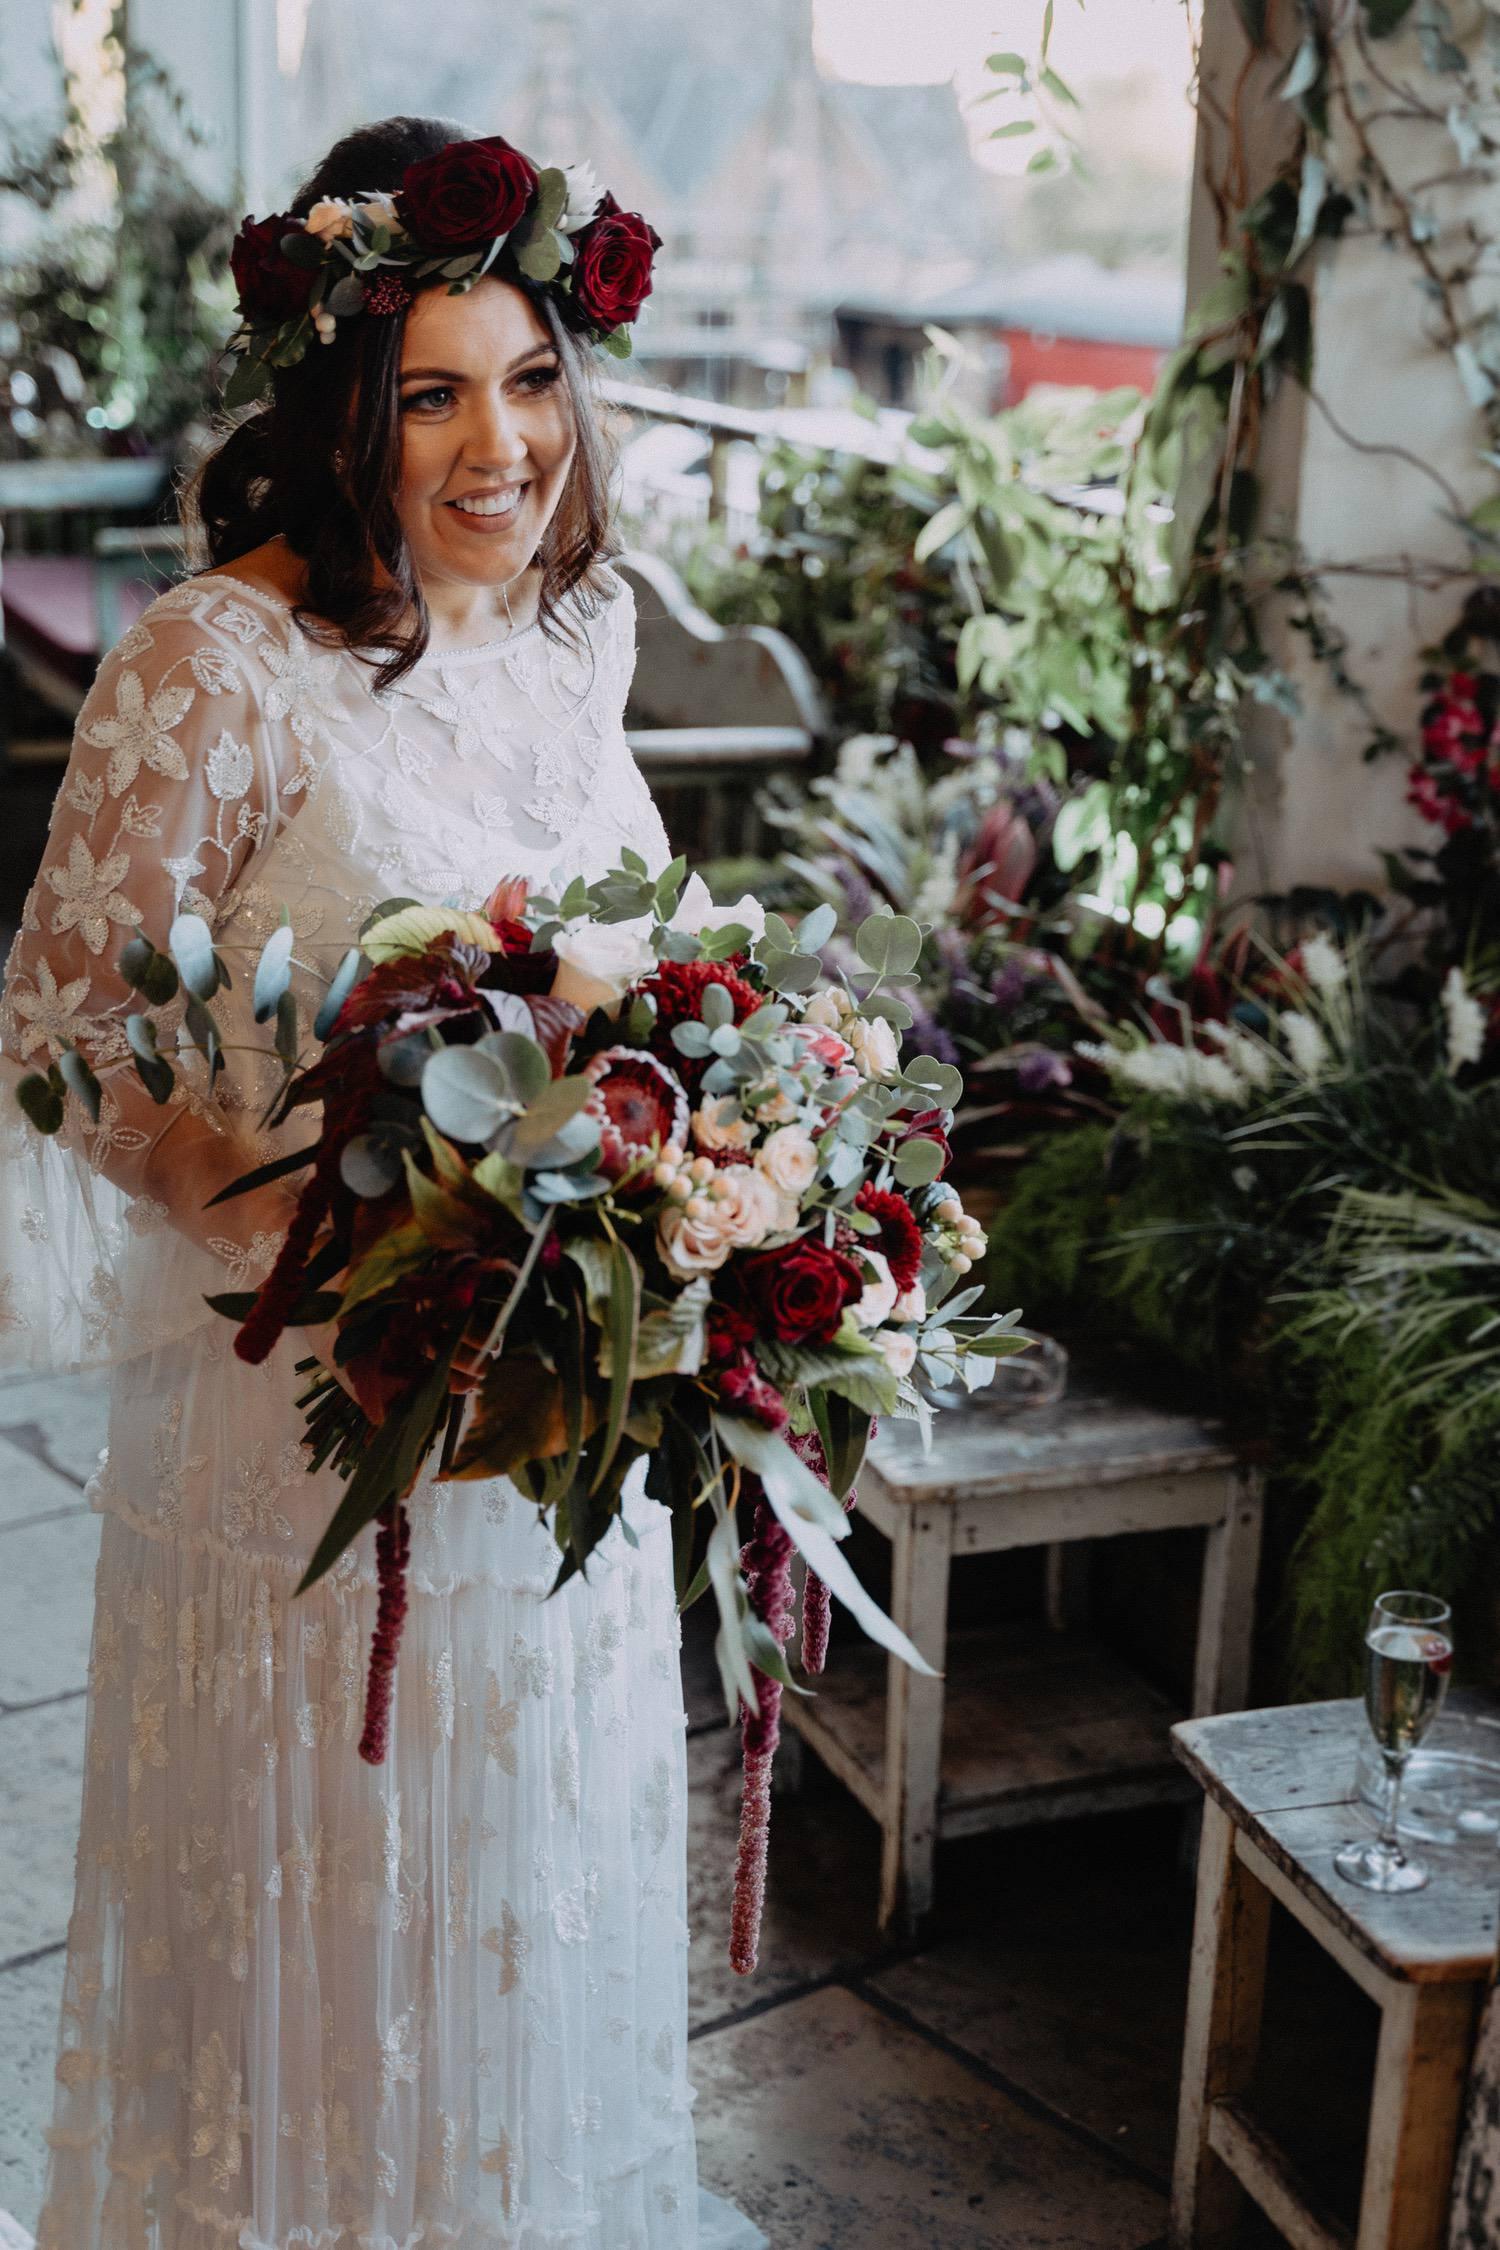 Wedding-Photographer-North-East-486.jpg